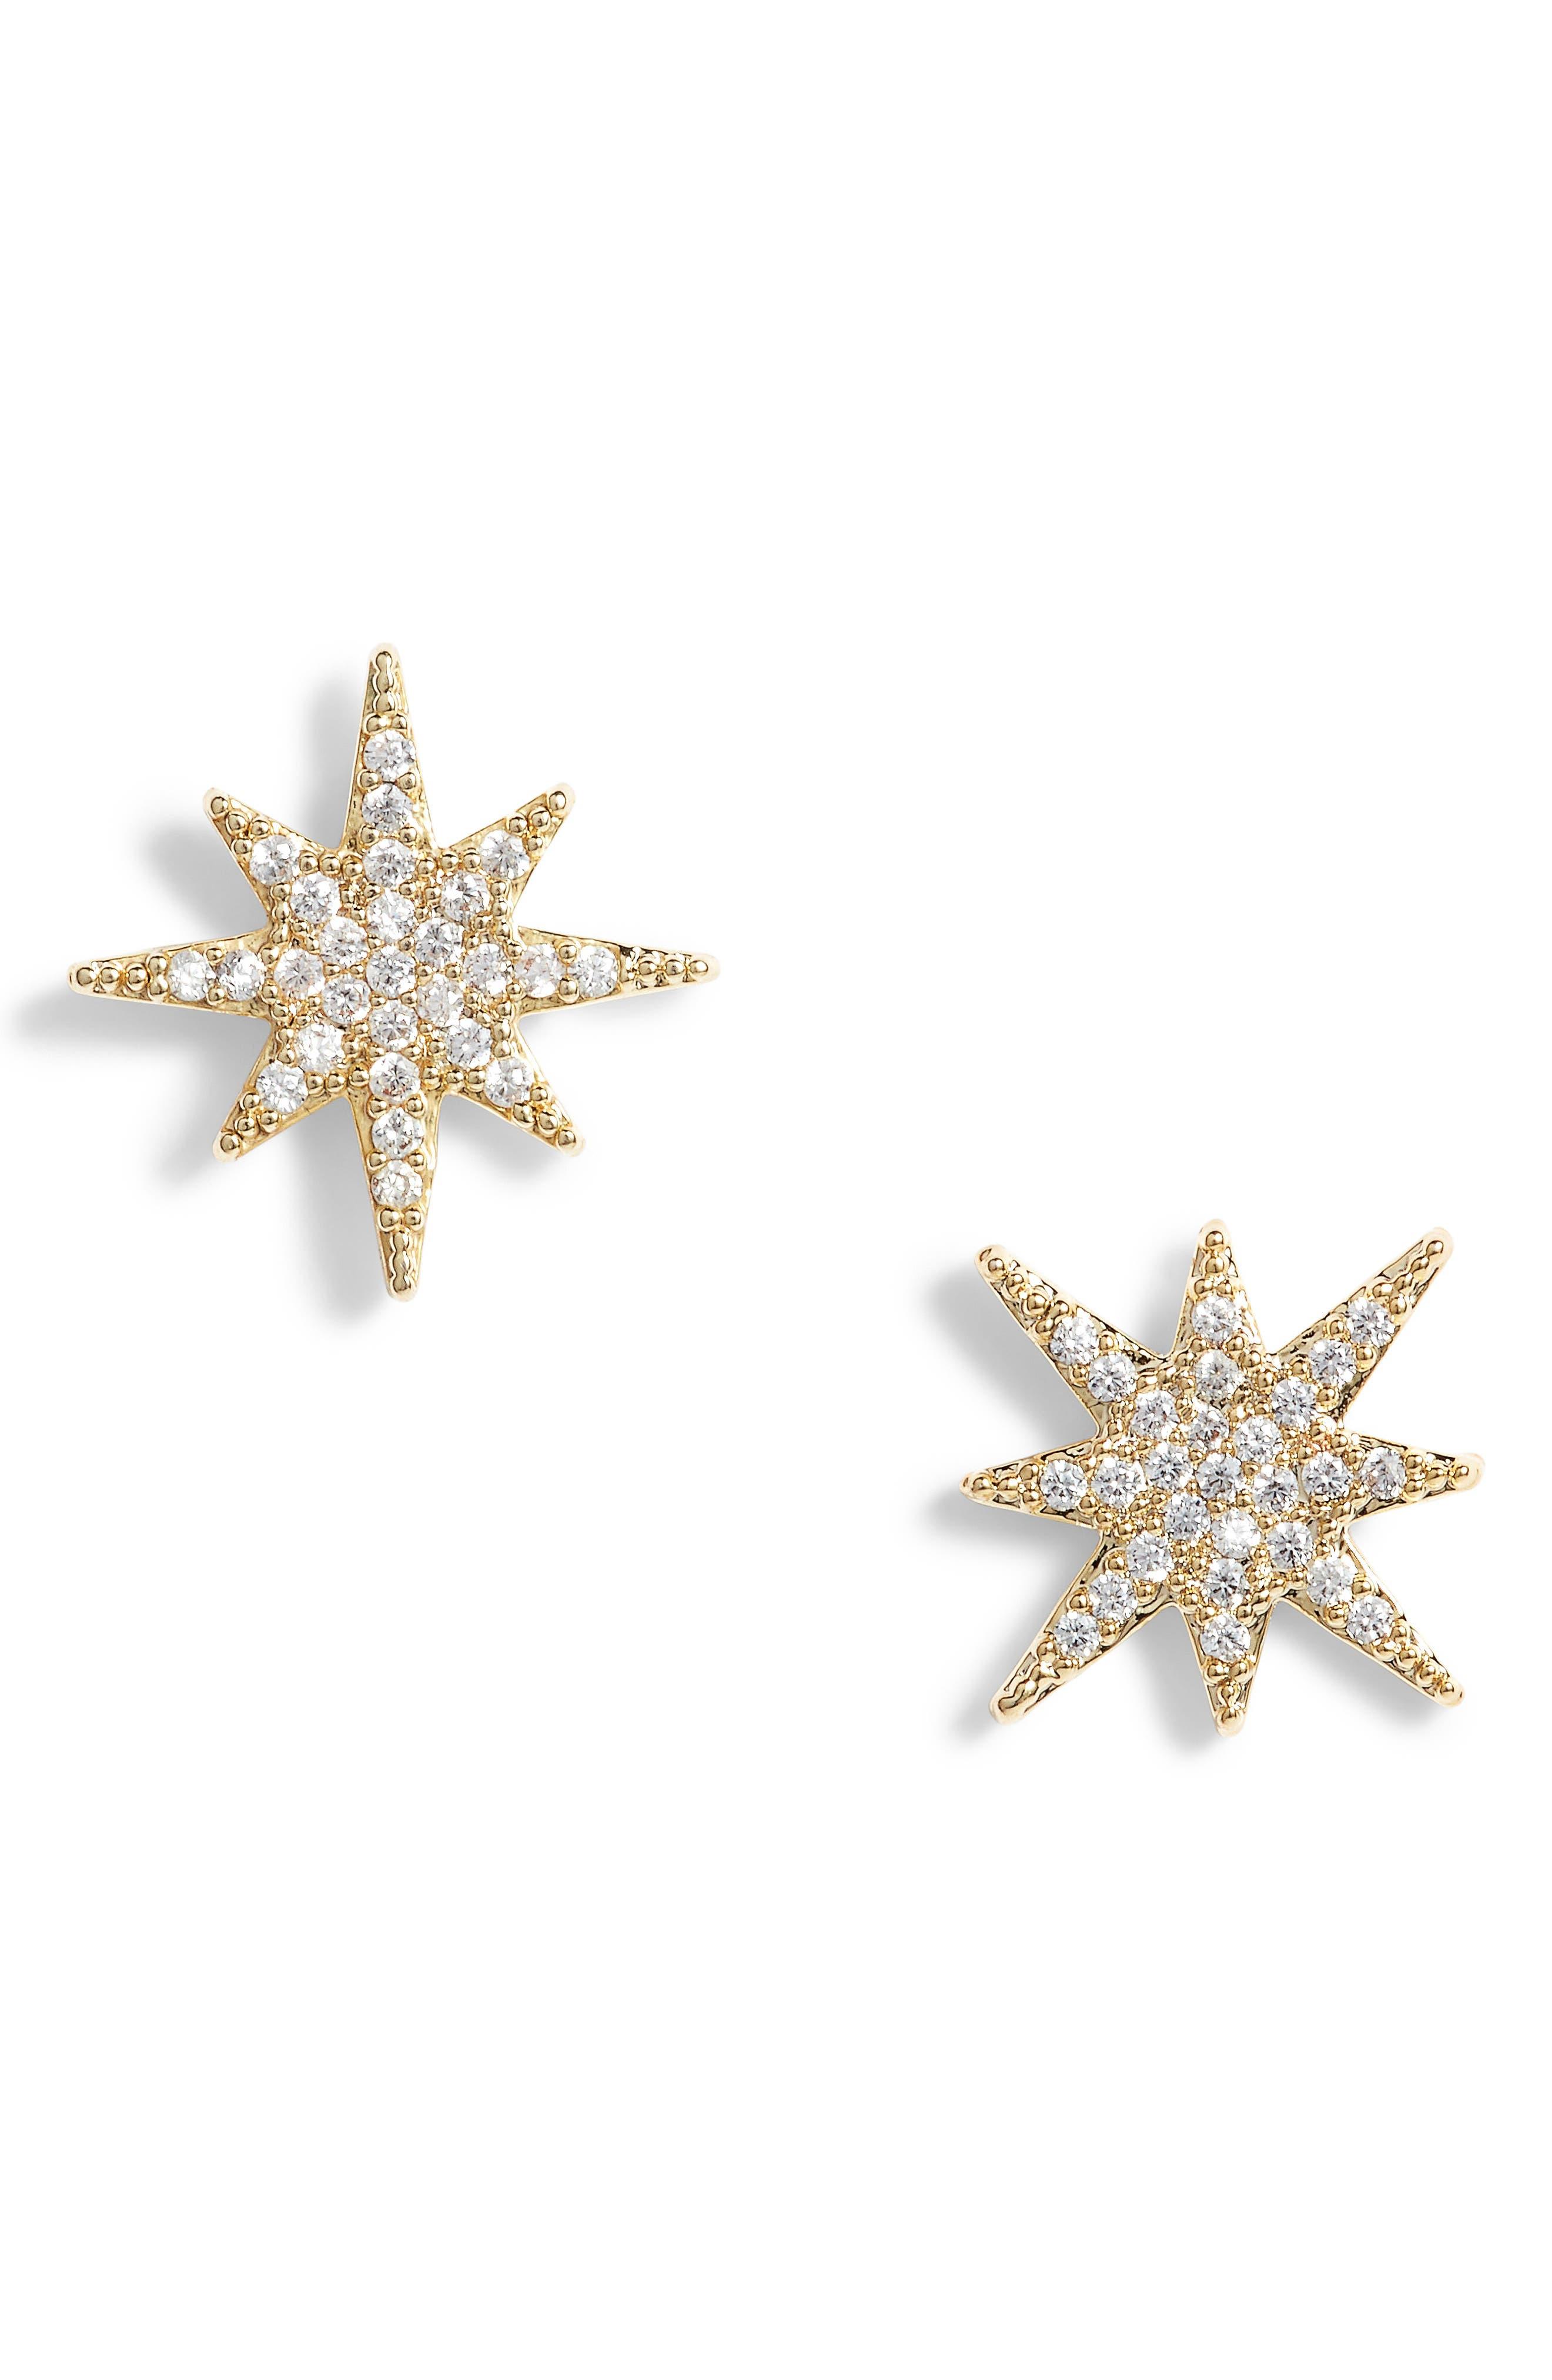 Main Image - Serefina Small Starburst Crystal Earrings